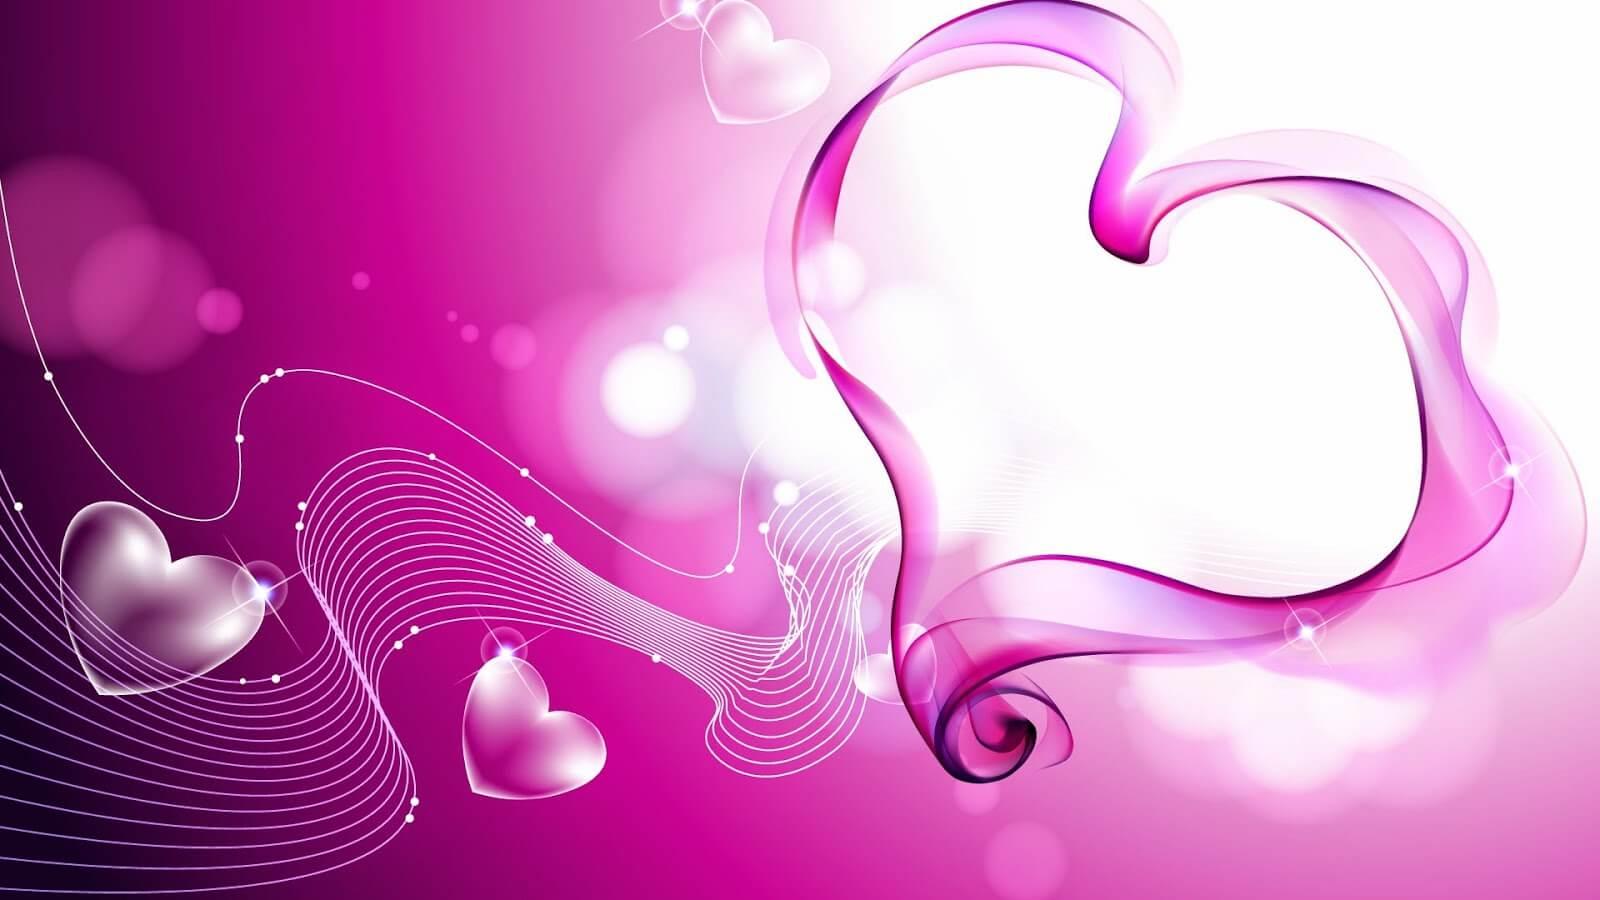 Hd Love Wallpapers 1080p Love Images Gud Tech Tricks